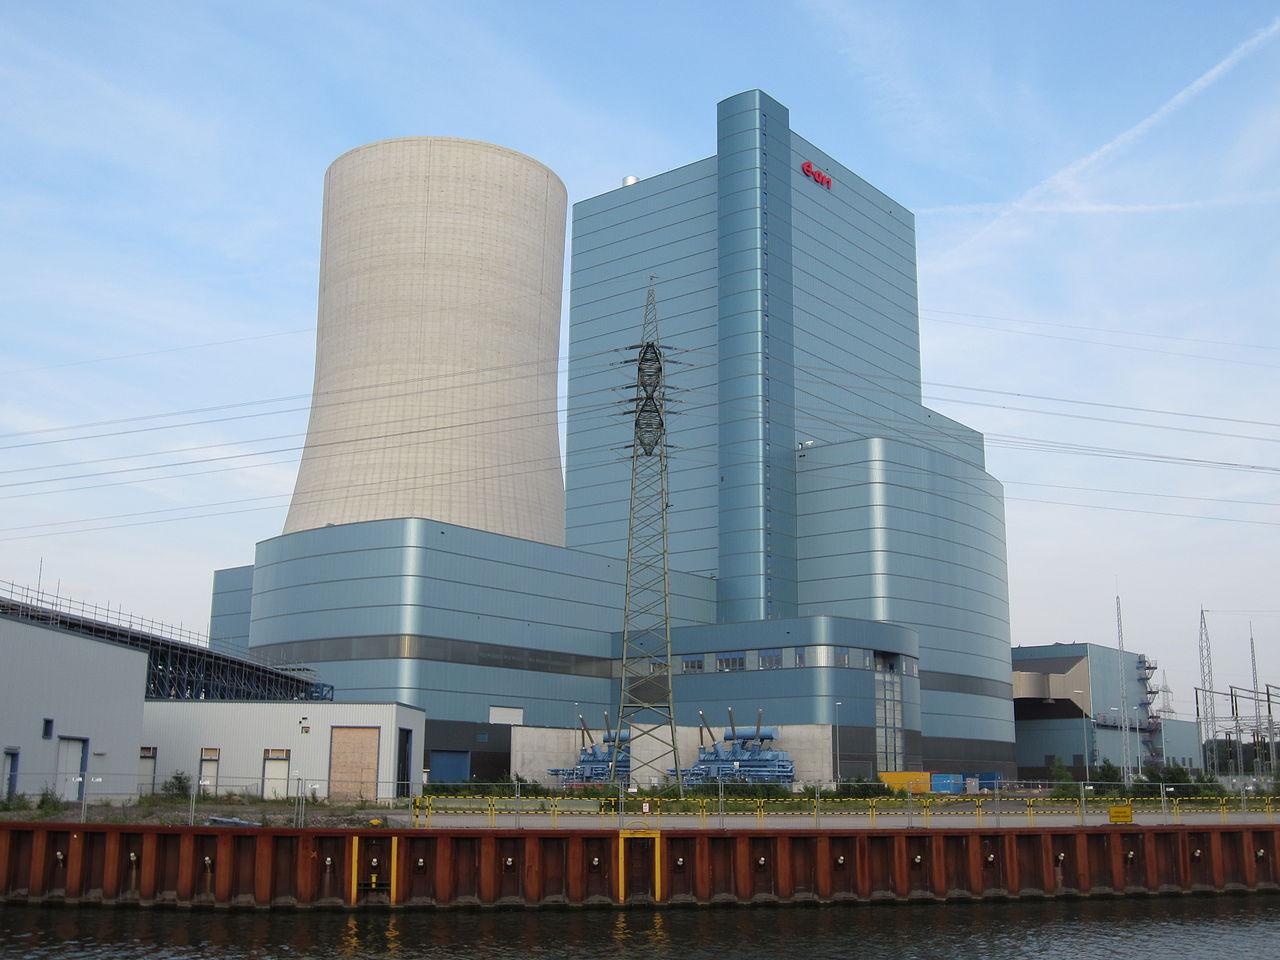 1280px-Kraftwerk_Datteln_IV_Neubau.JPG